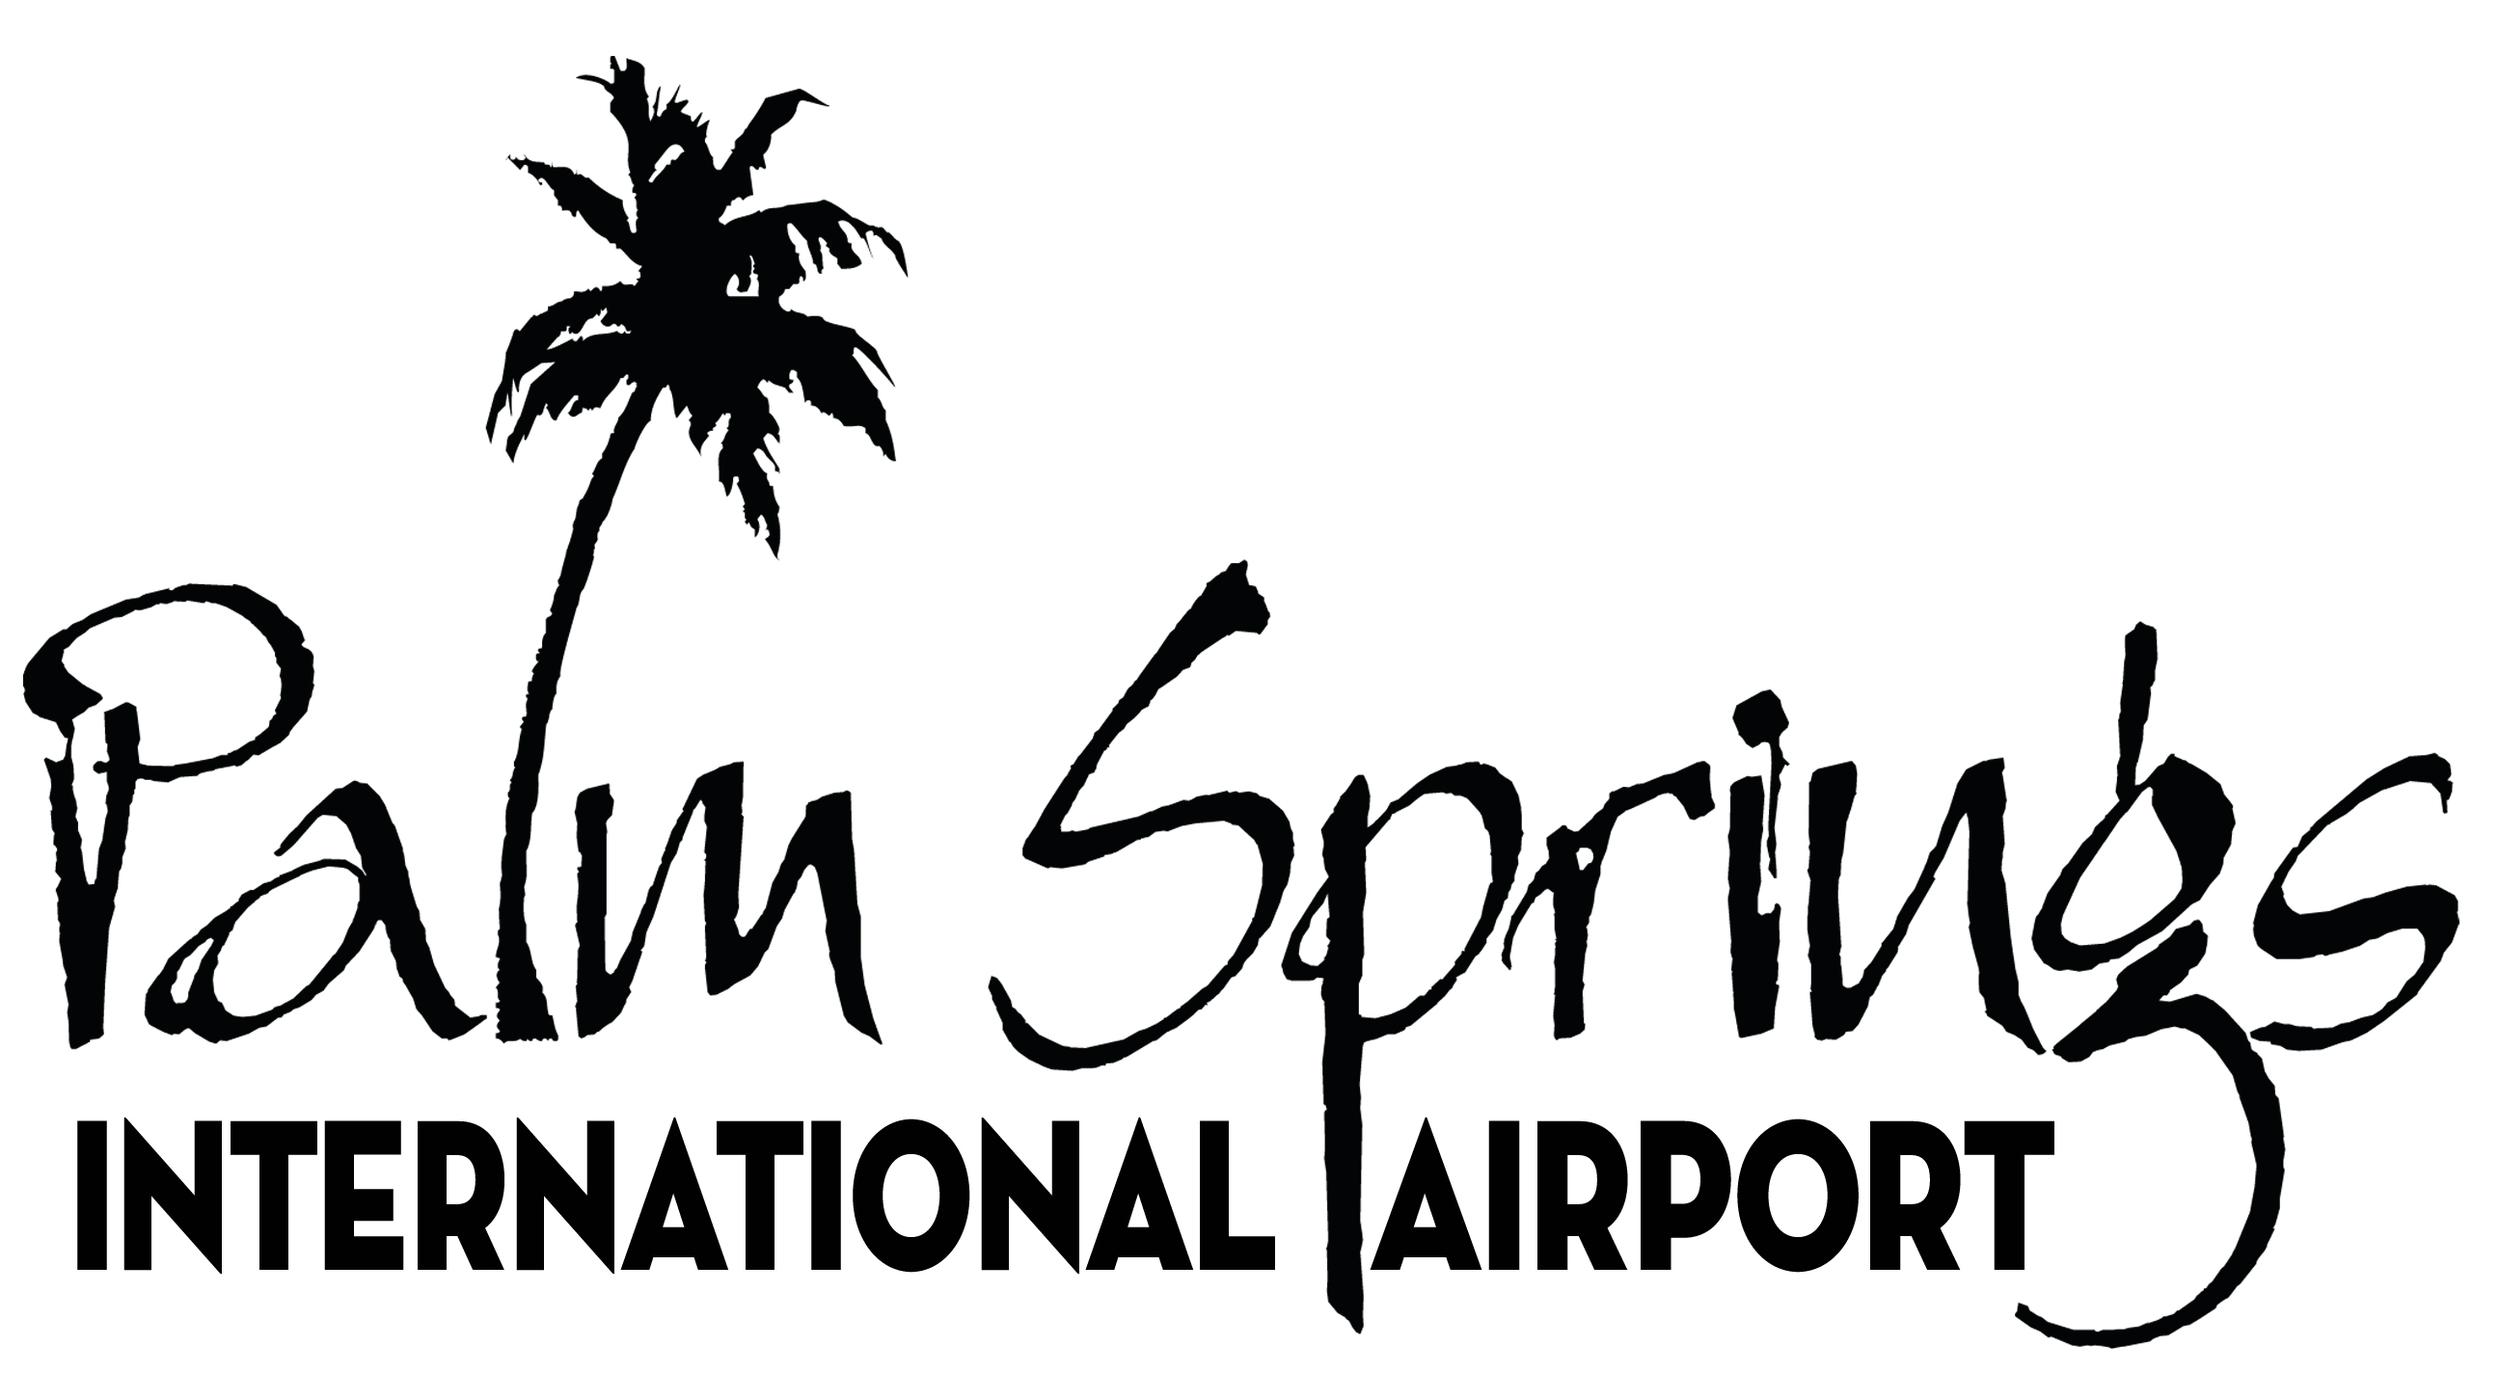 PalmSprings-InternationalAirport.png